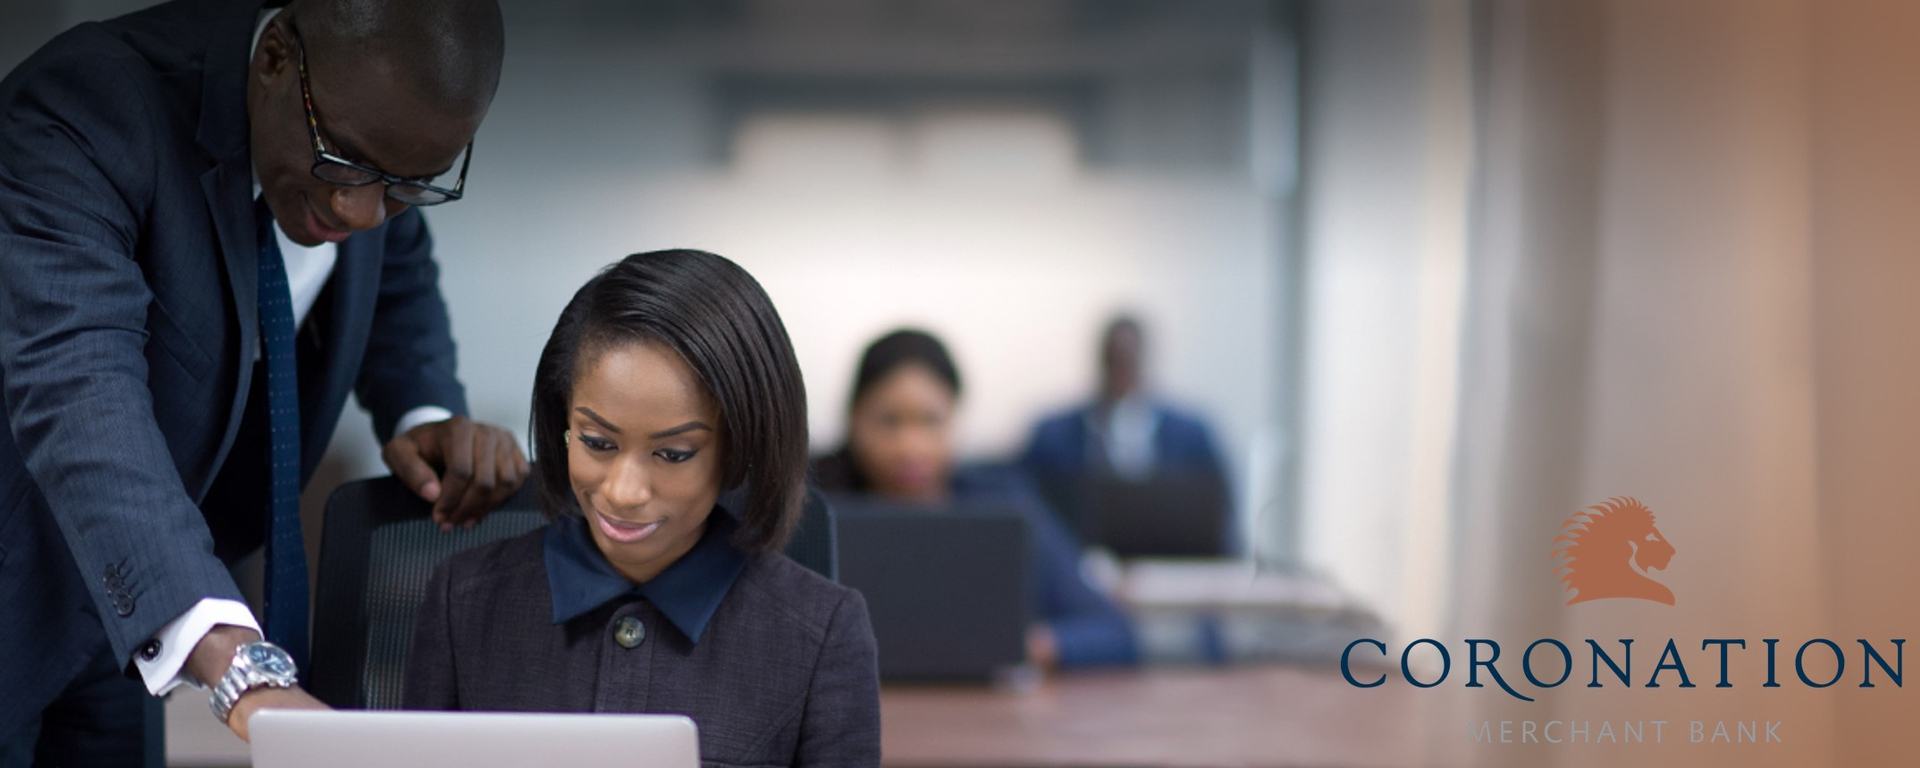 Coronation Merchant Bank - Leadership Role Movemeback African opportunity cover image